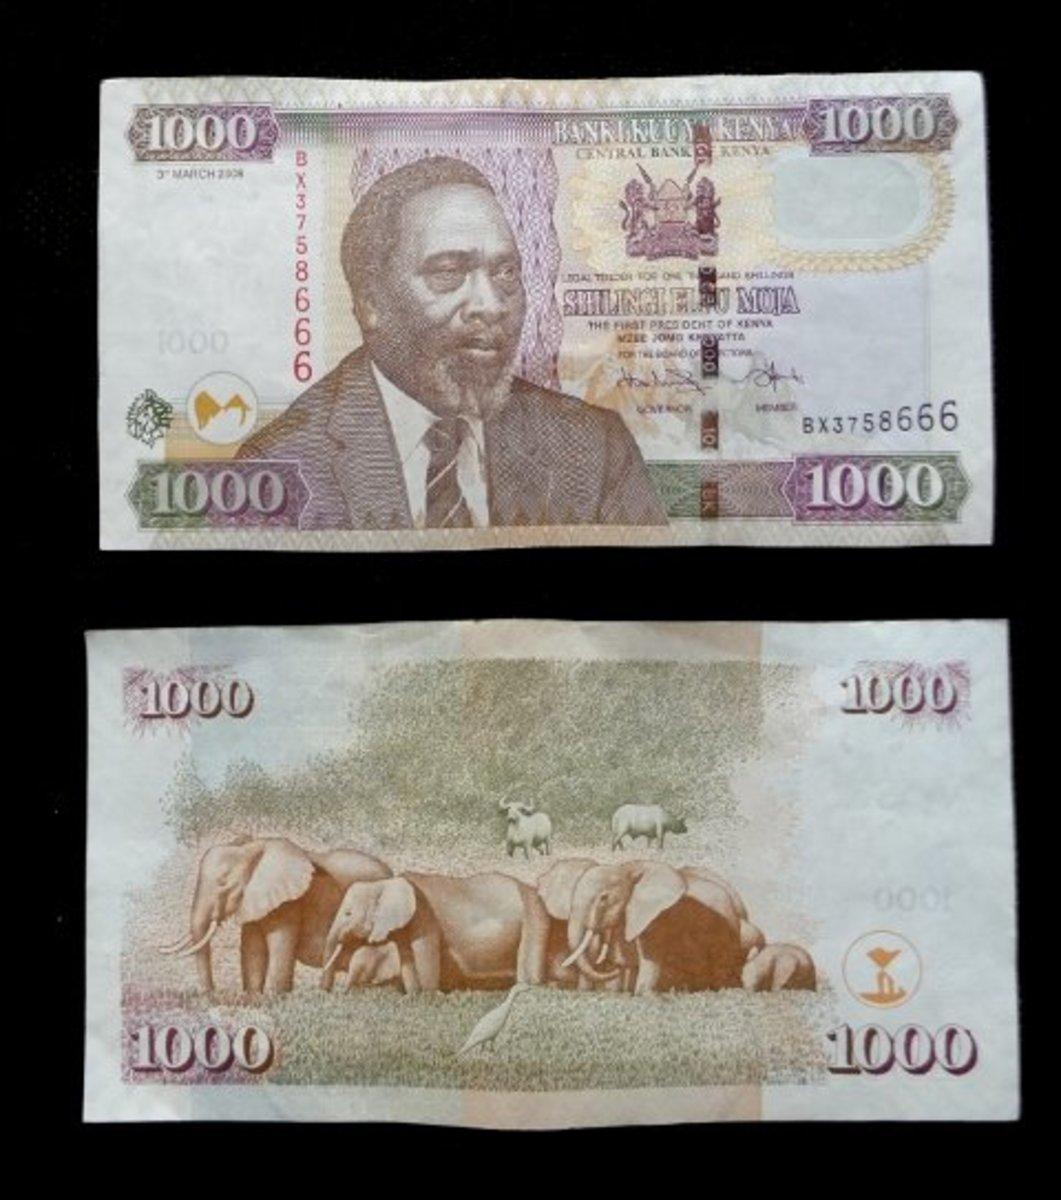 A one thousand Kenya Shillings note